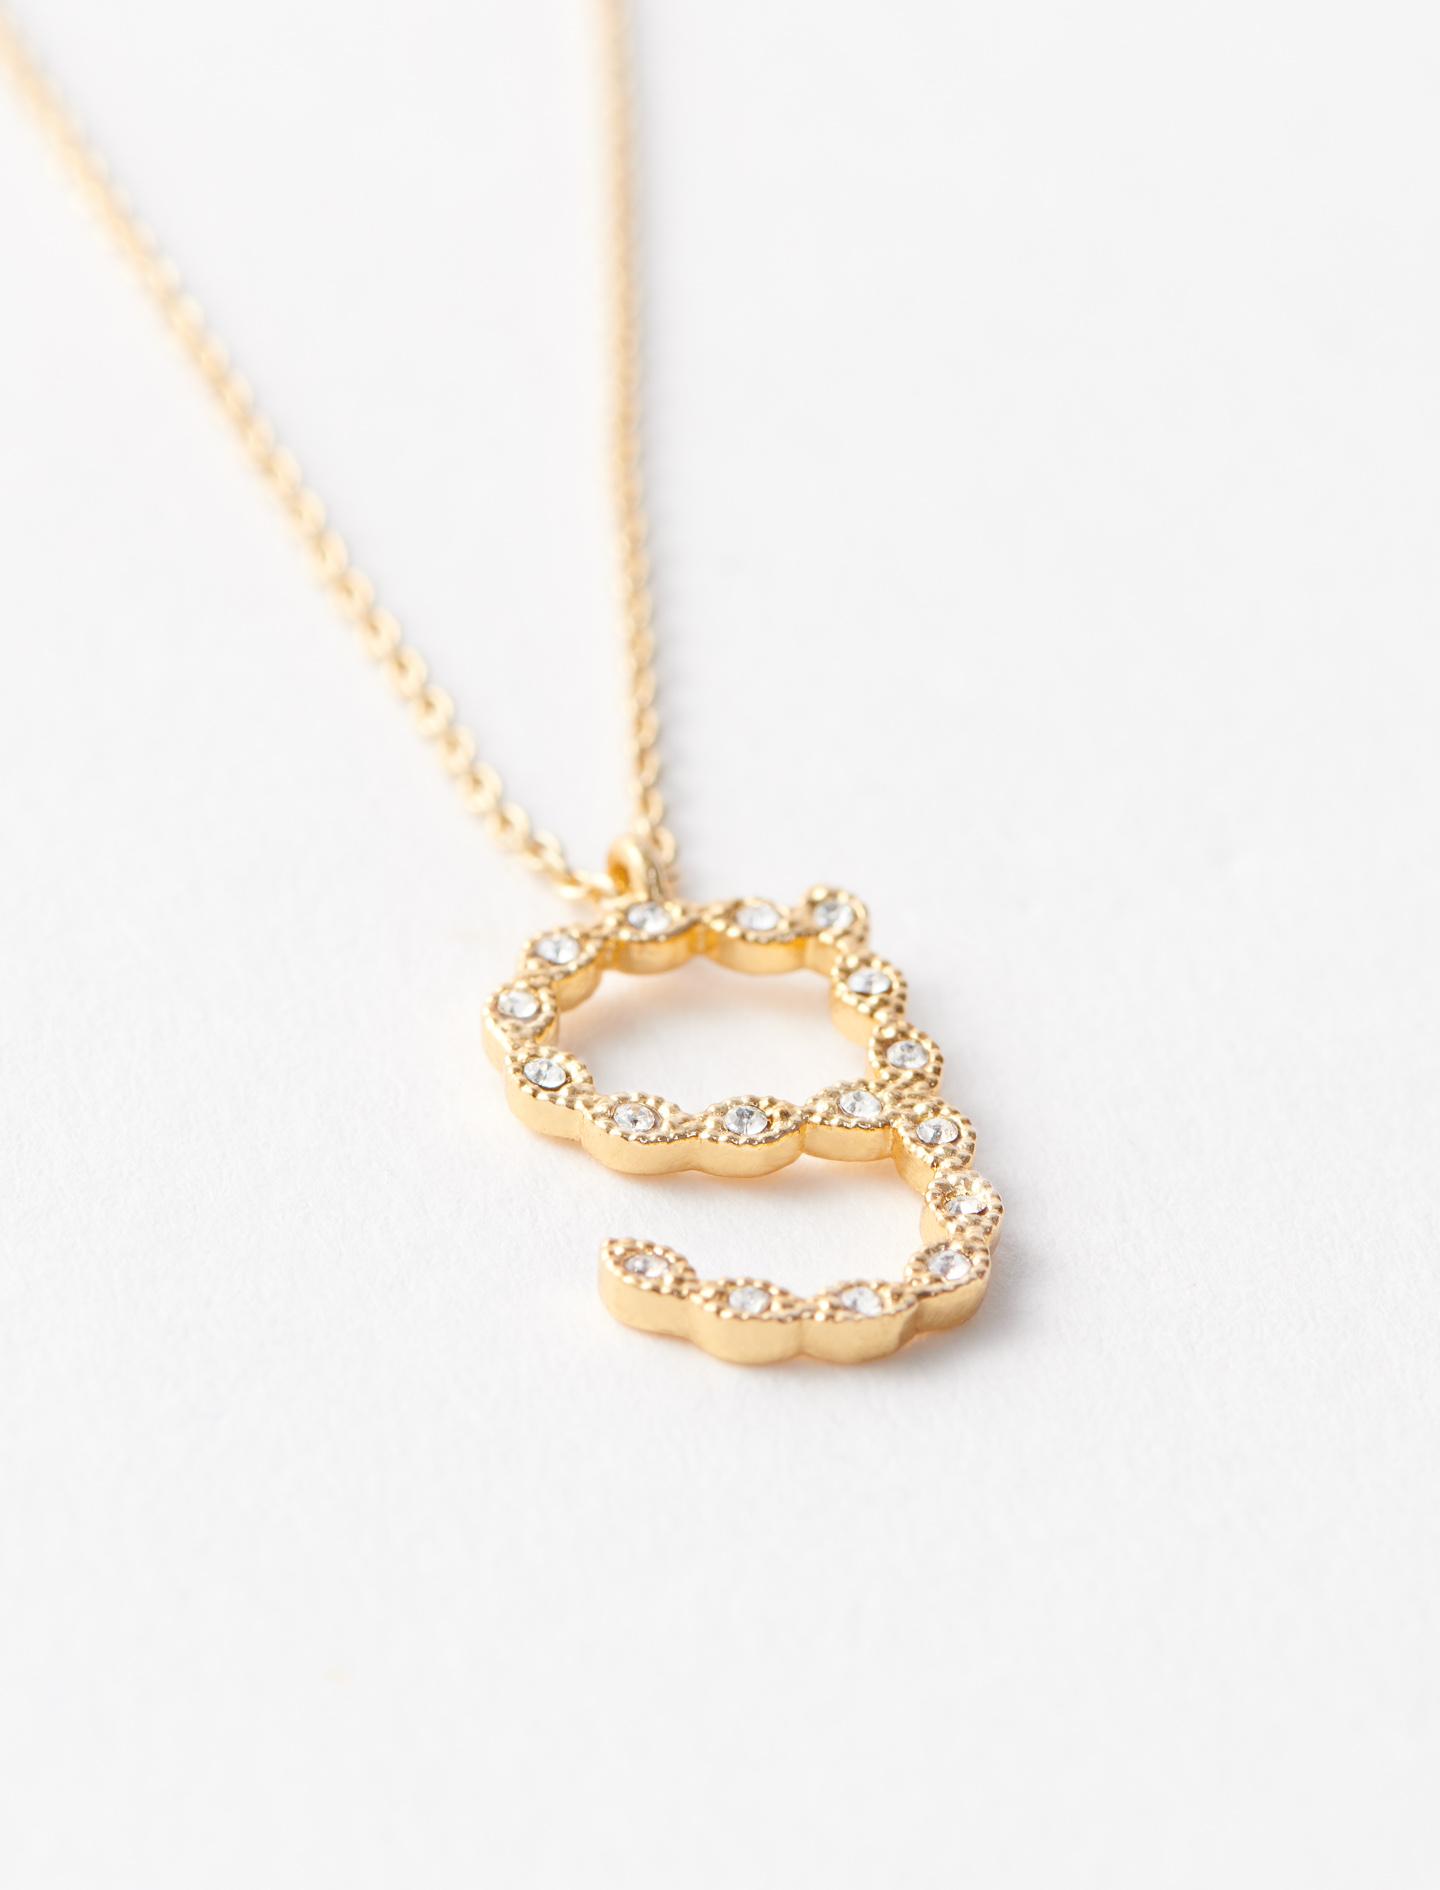 Rhinestone G necklace - Gold